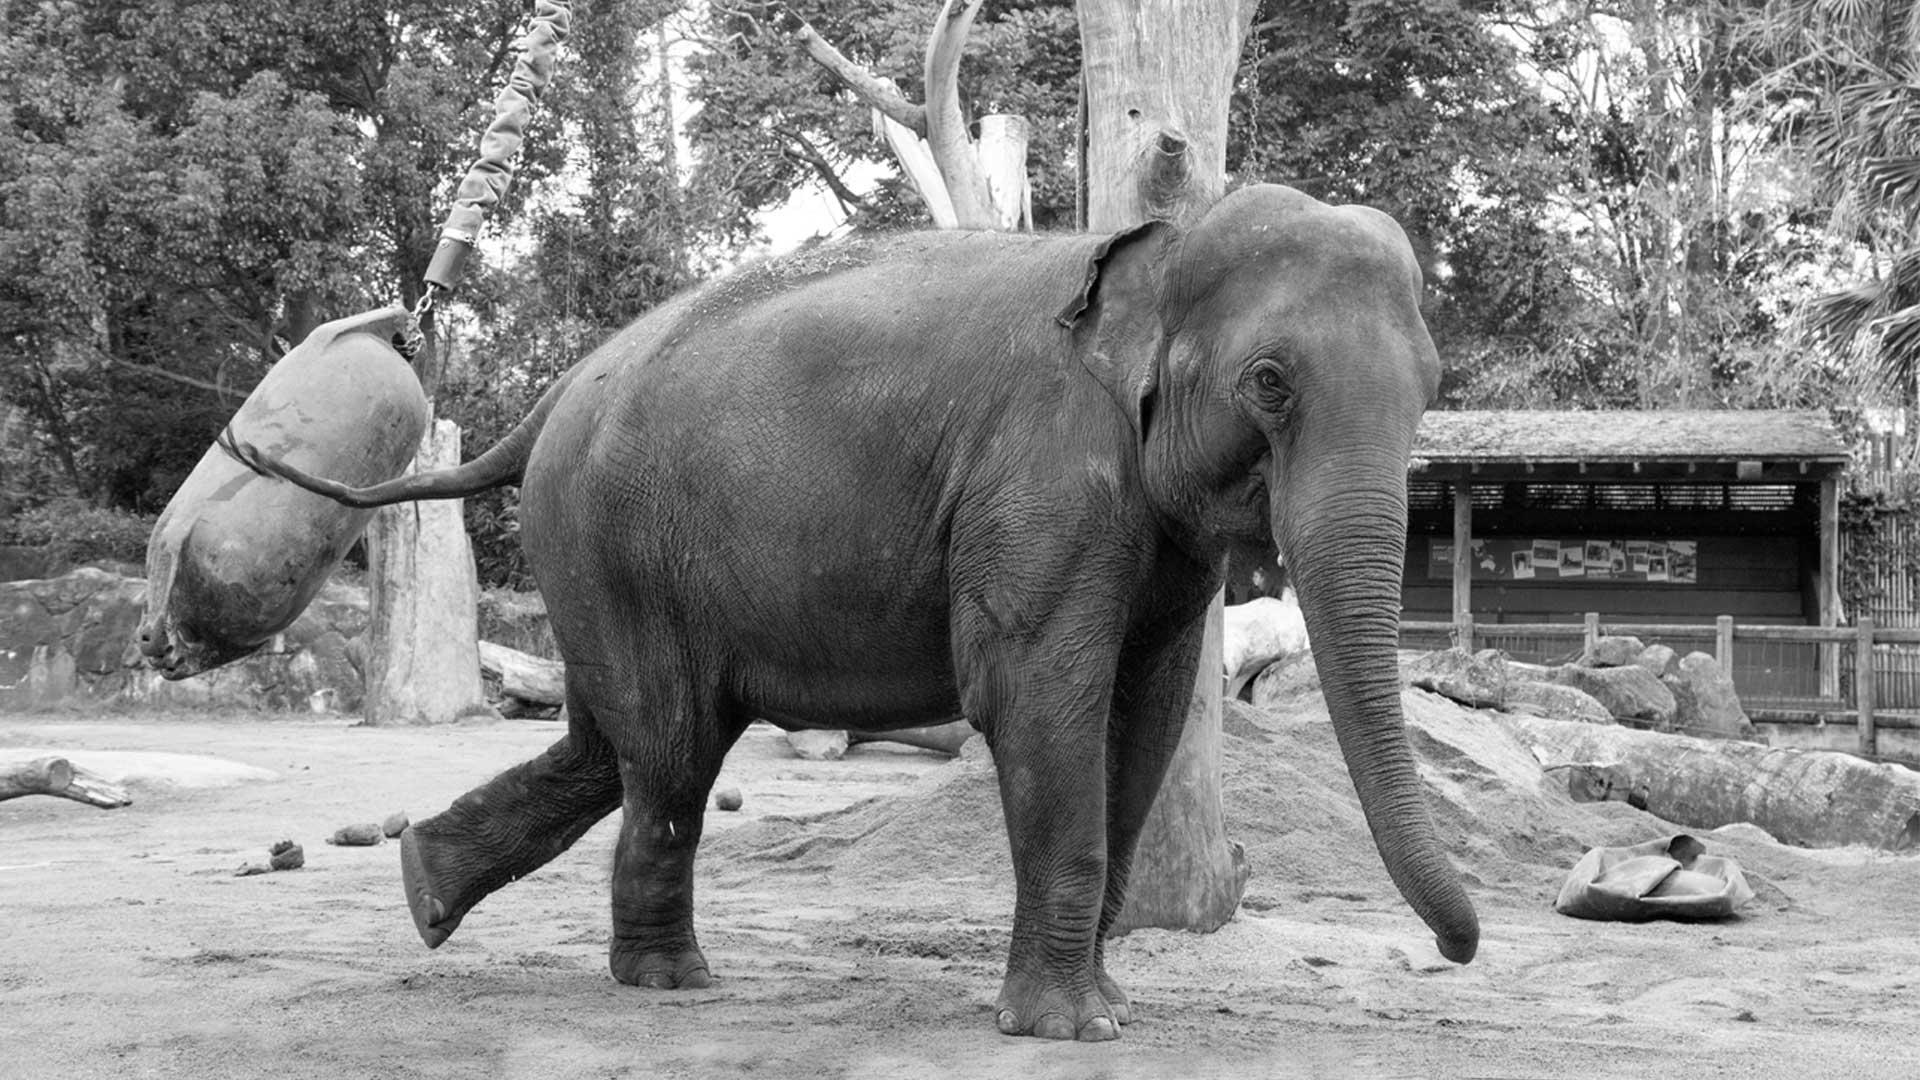 https://rfacdn.nz/zoo/assets/media/world-elephant-day-gallery-11.jpg